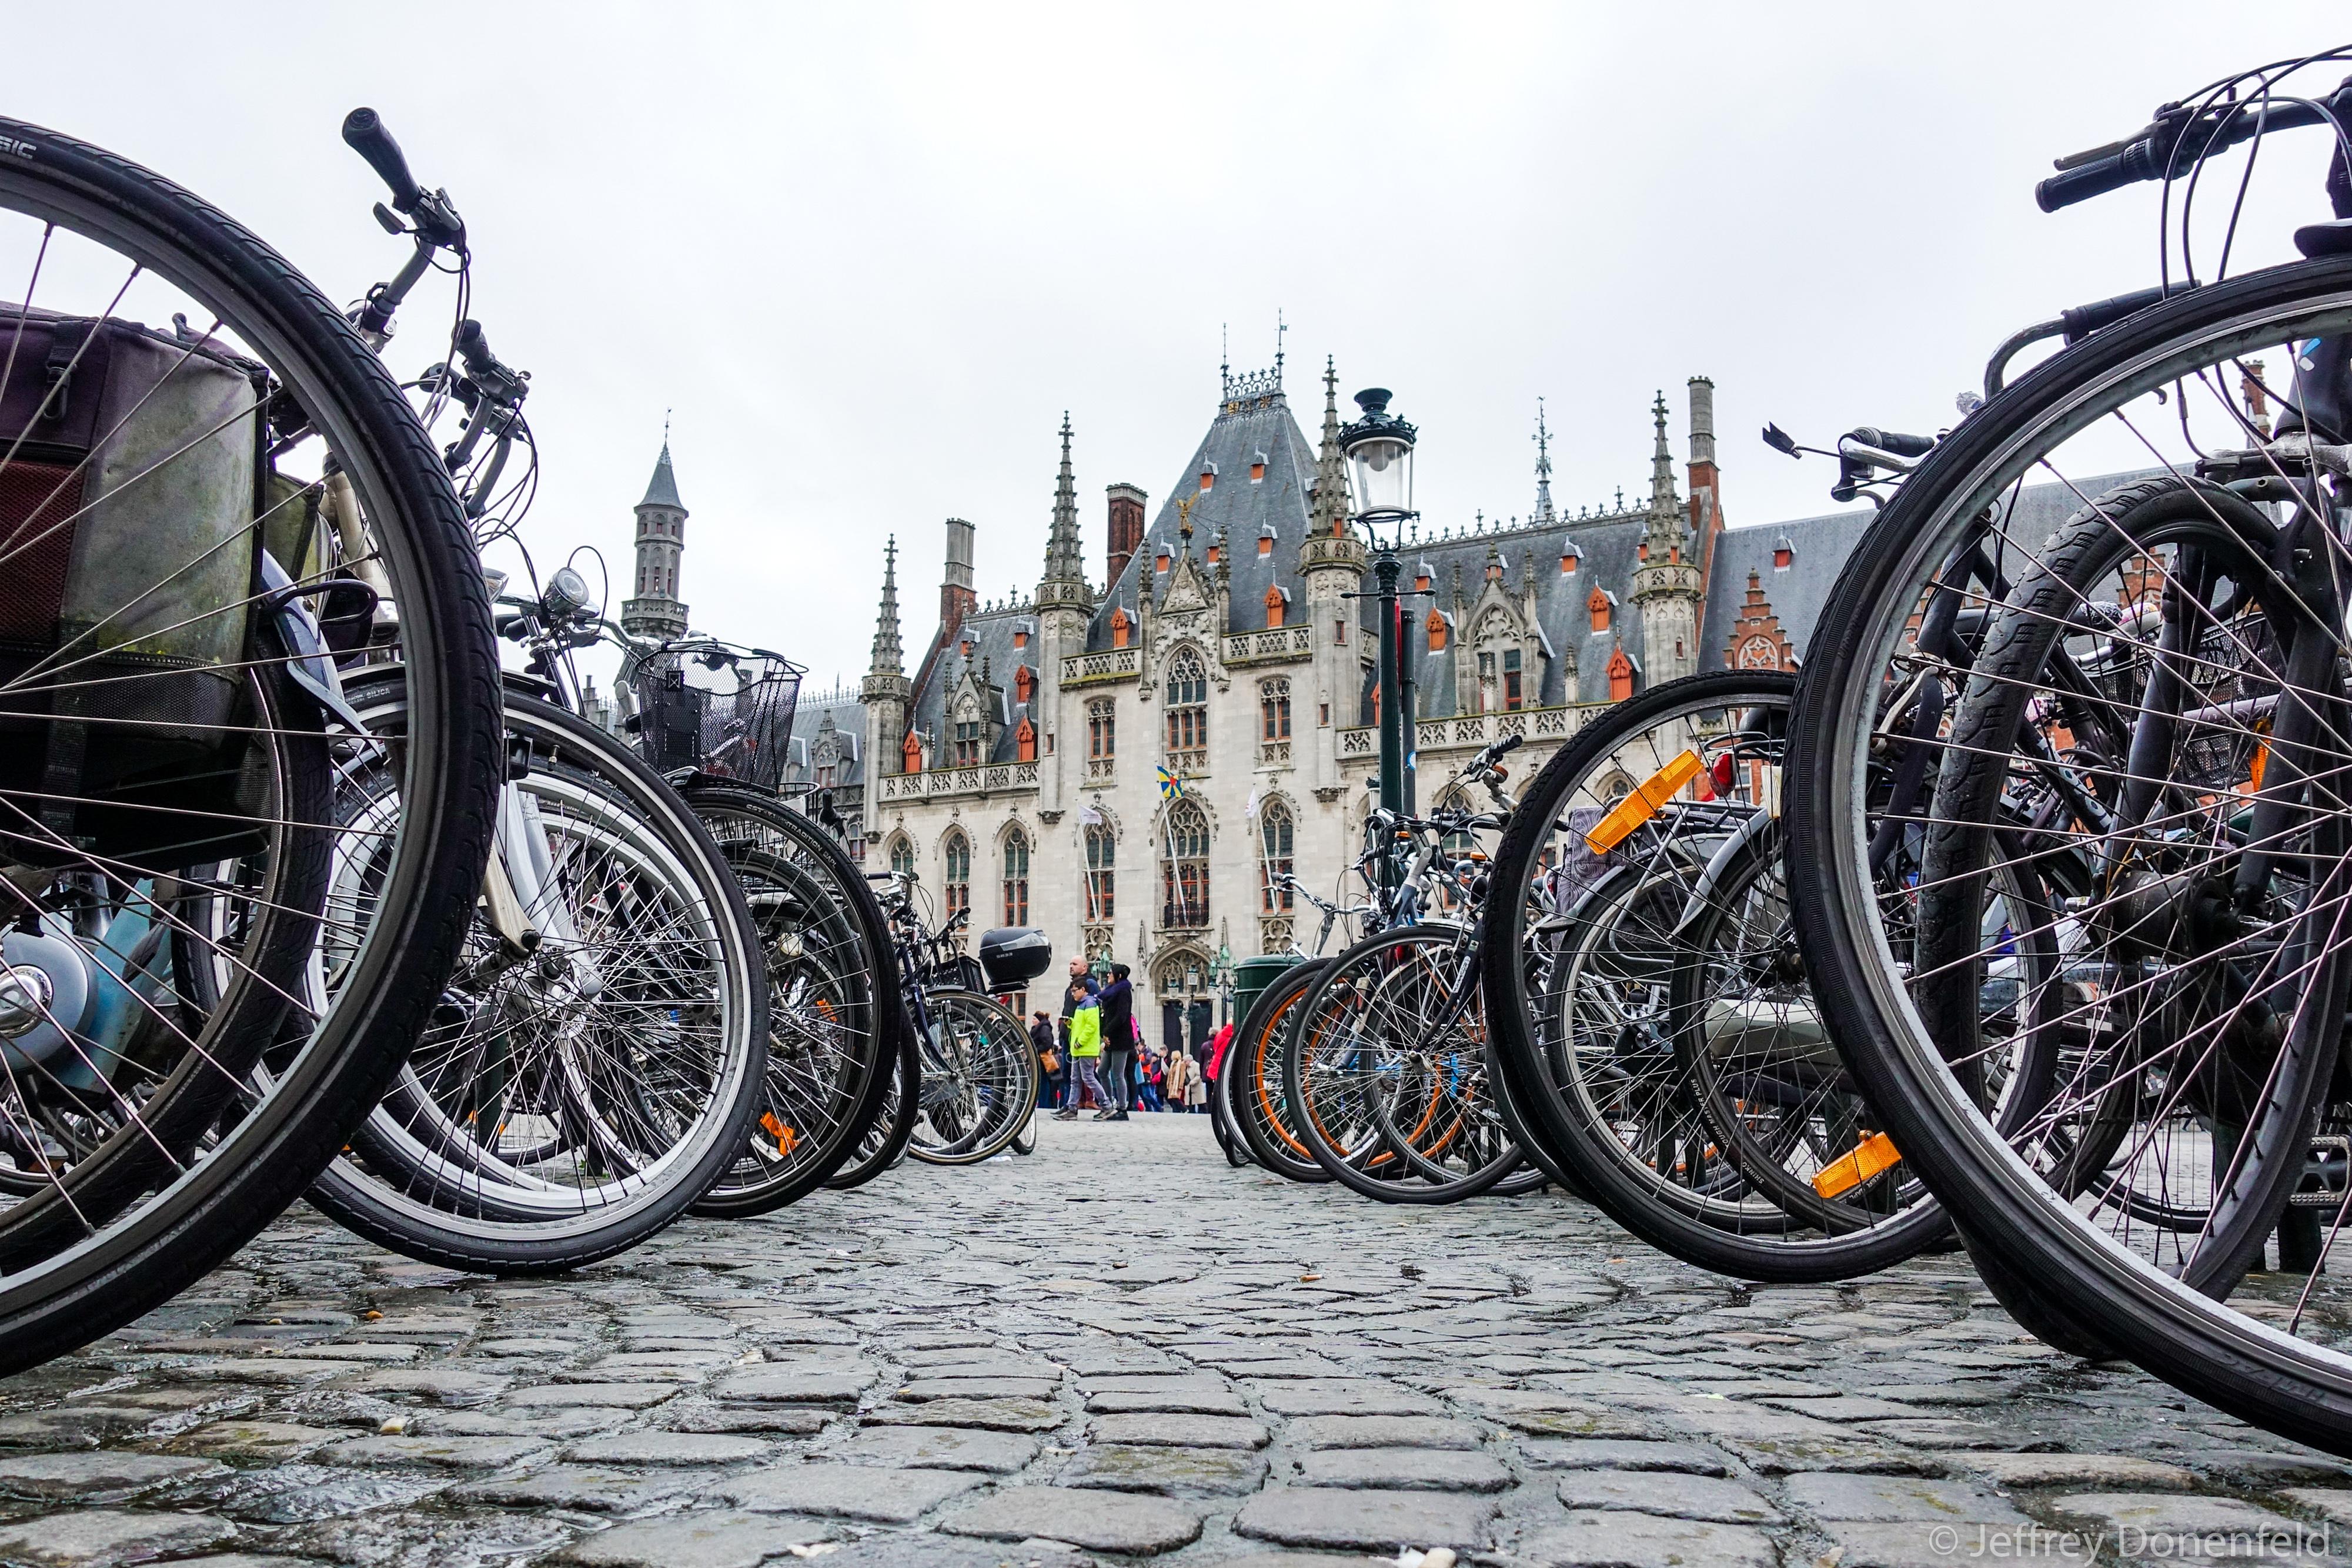 Lots of bikes in Brussels